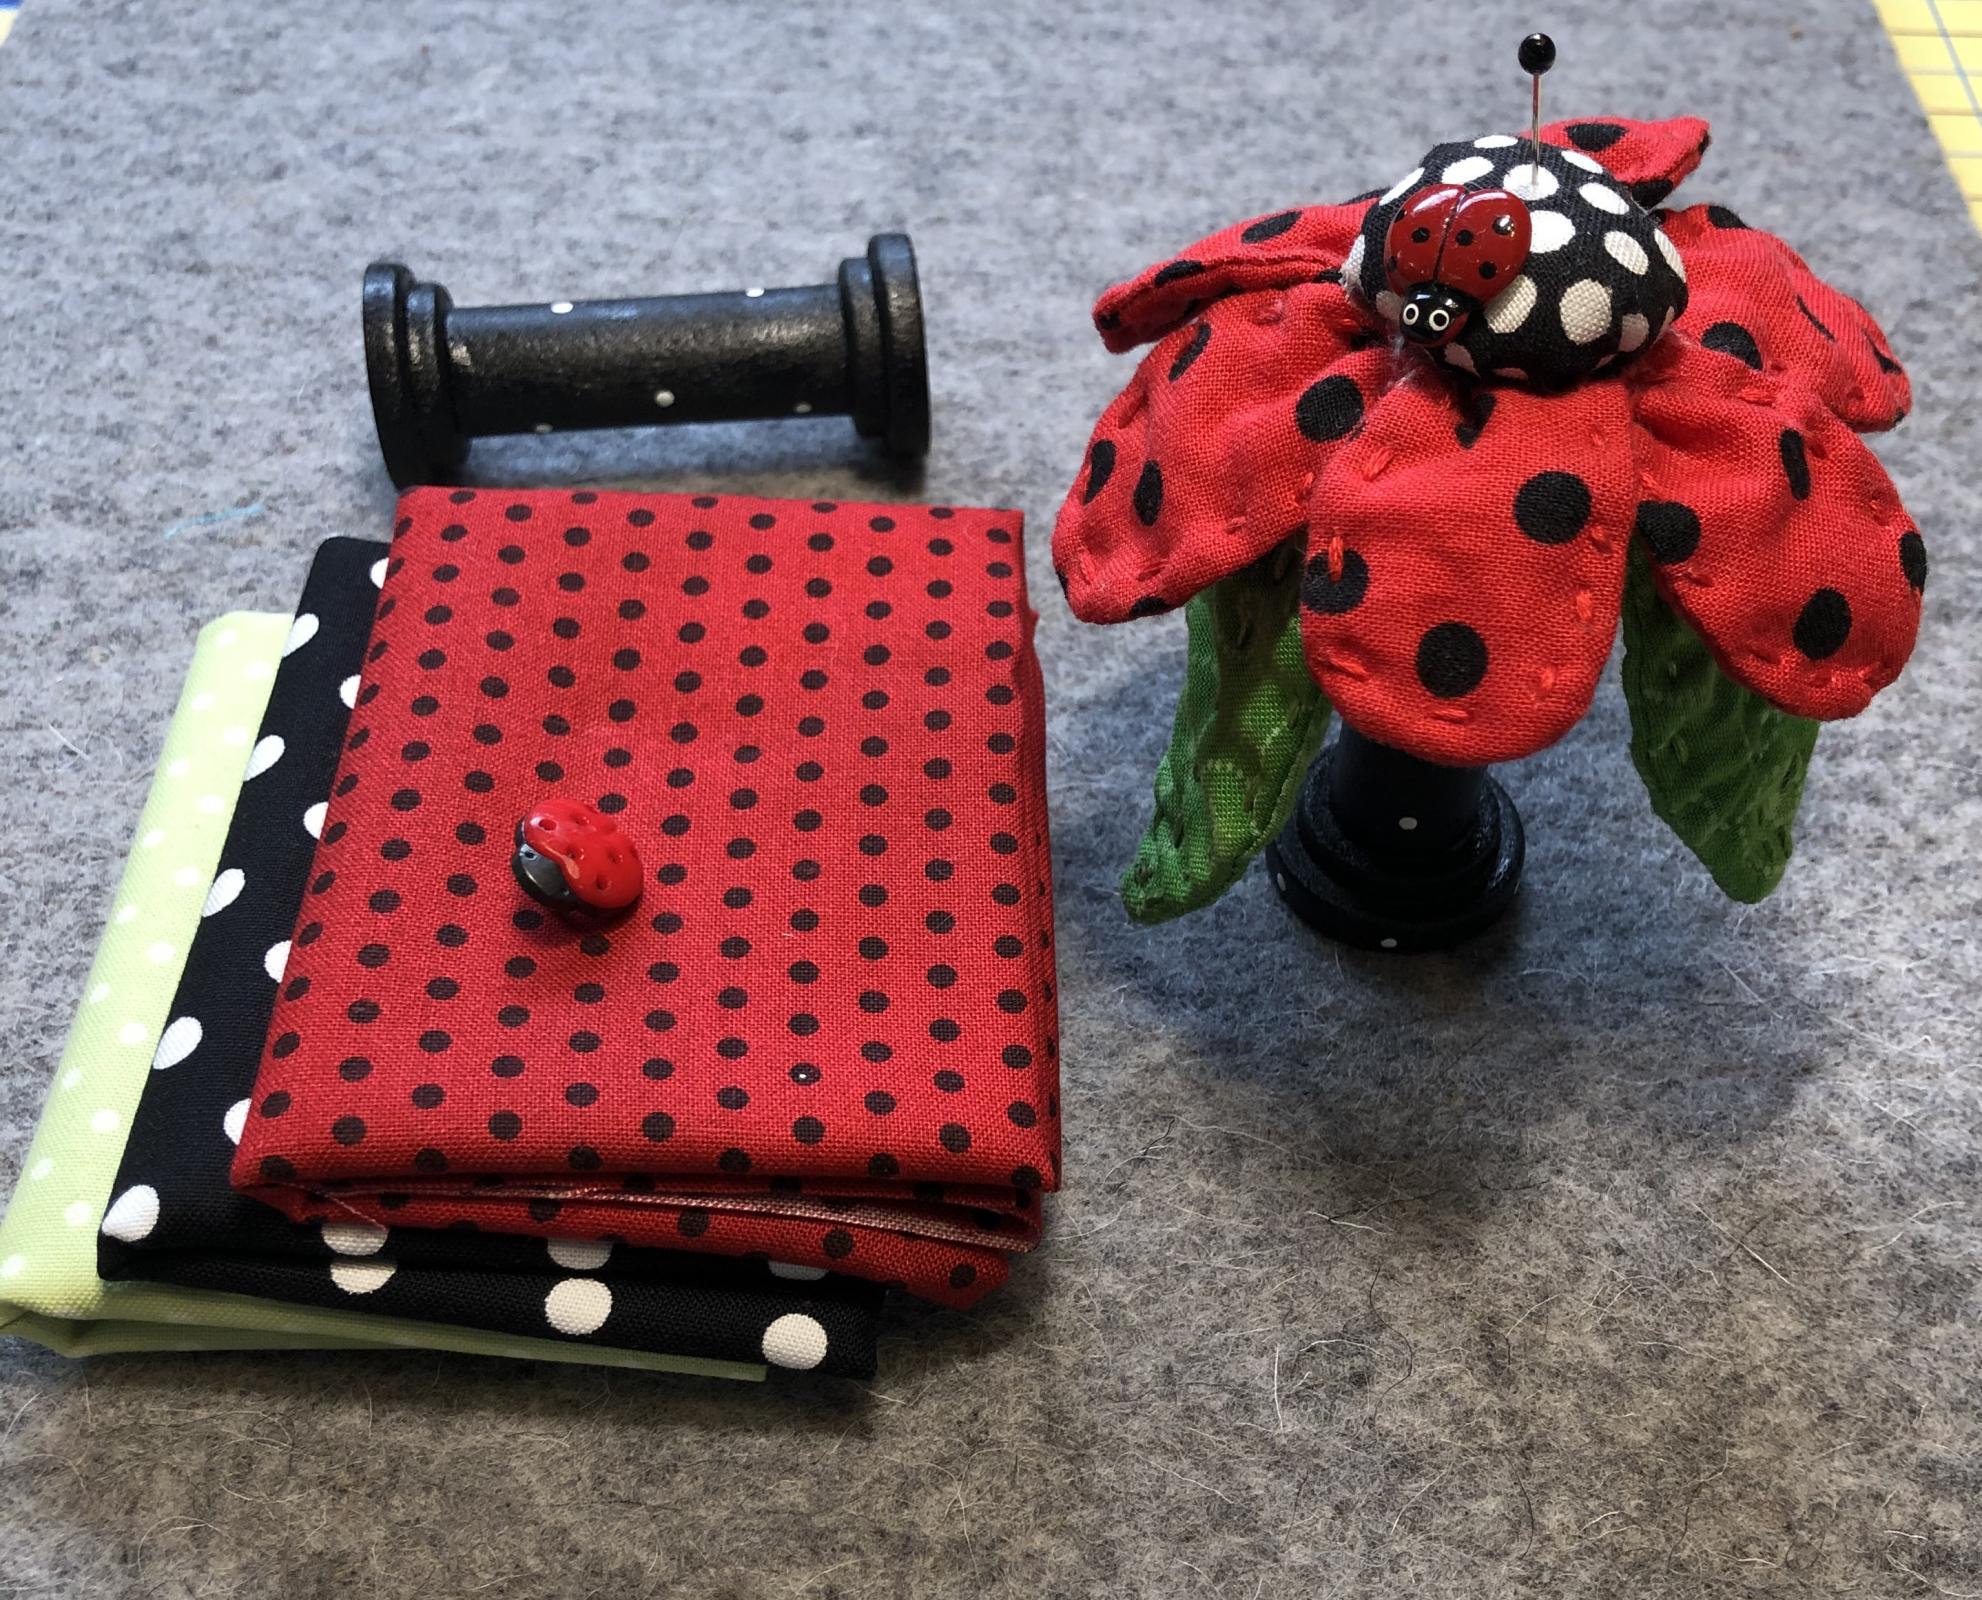 Flower Pincushion Kit w wooden spool - Ladybug